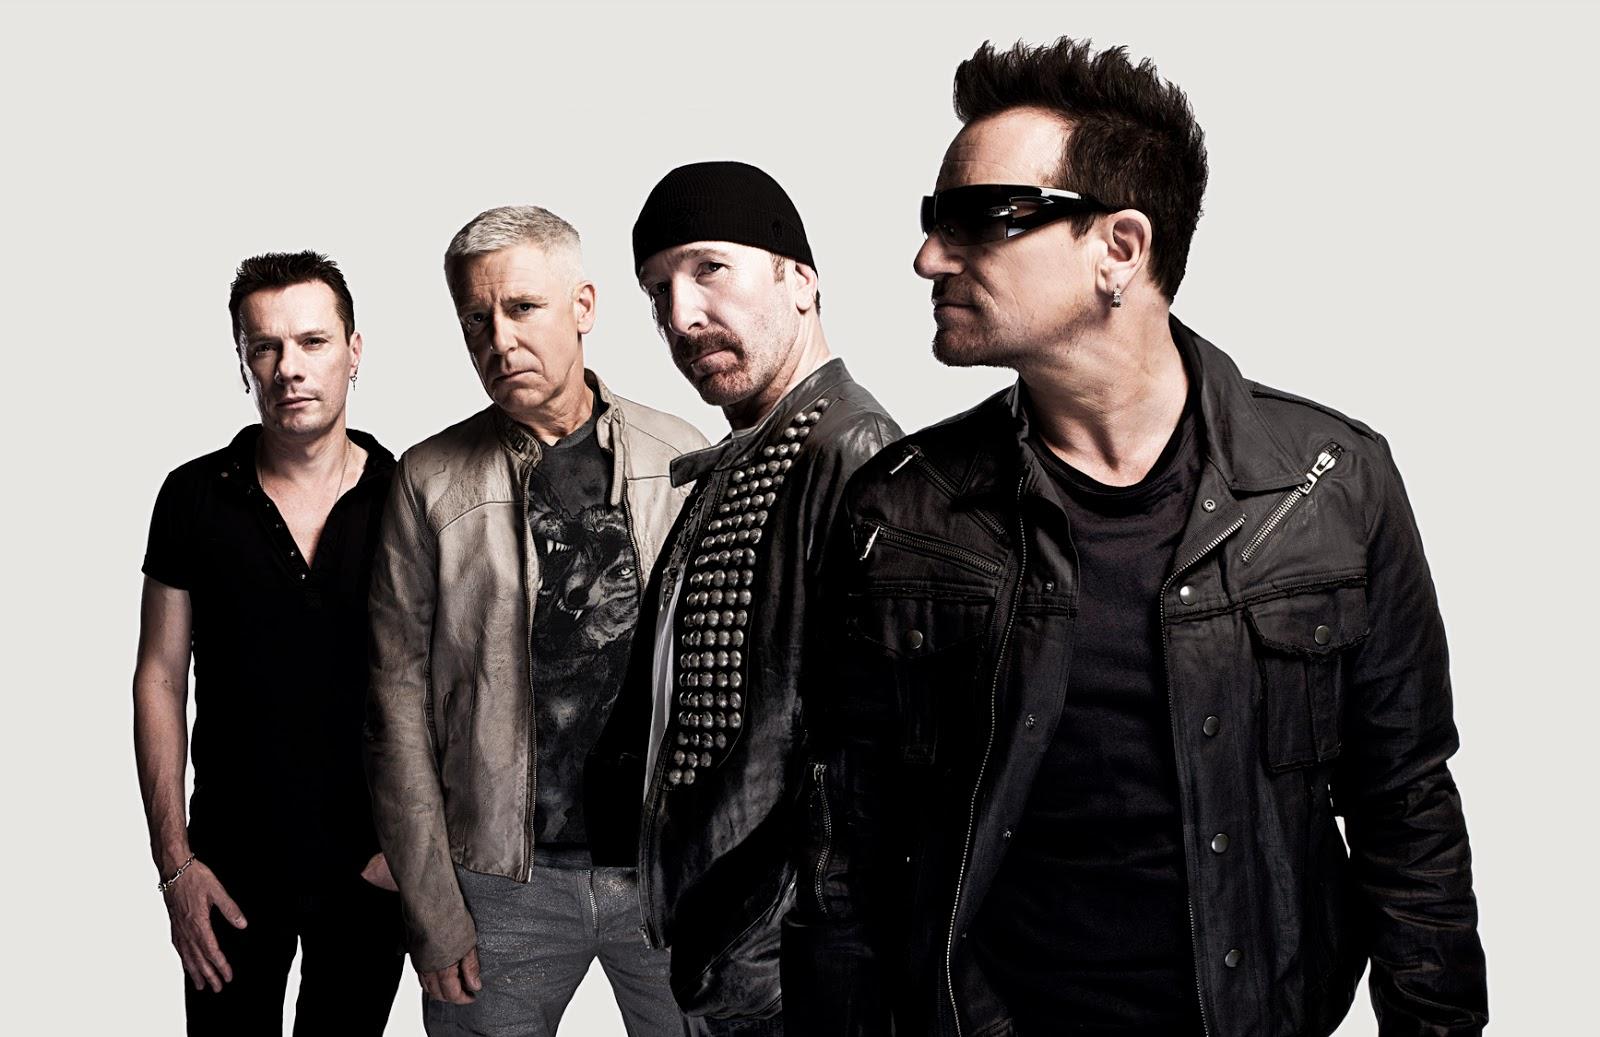 Profil dan Biografi Lengkap U2